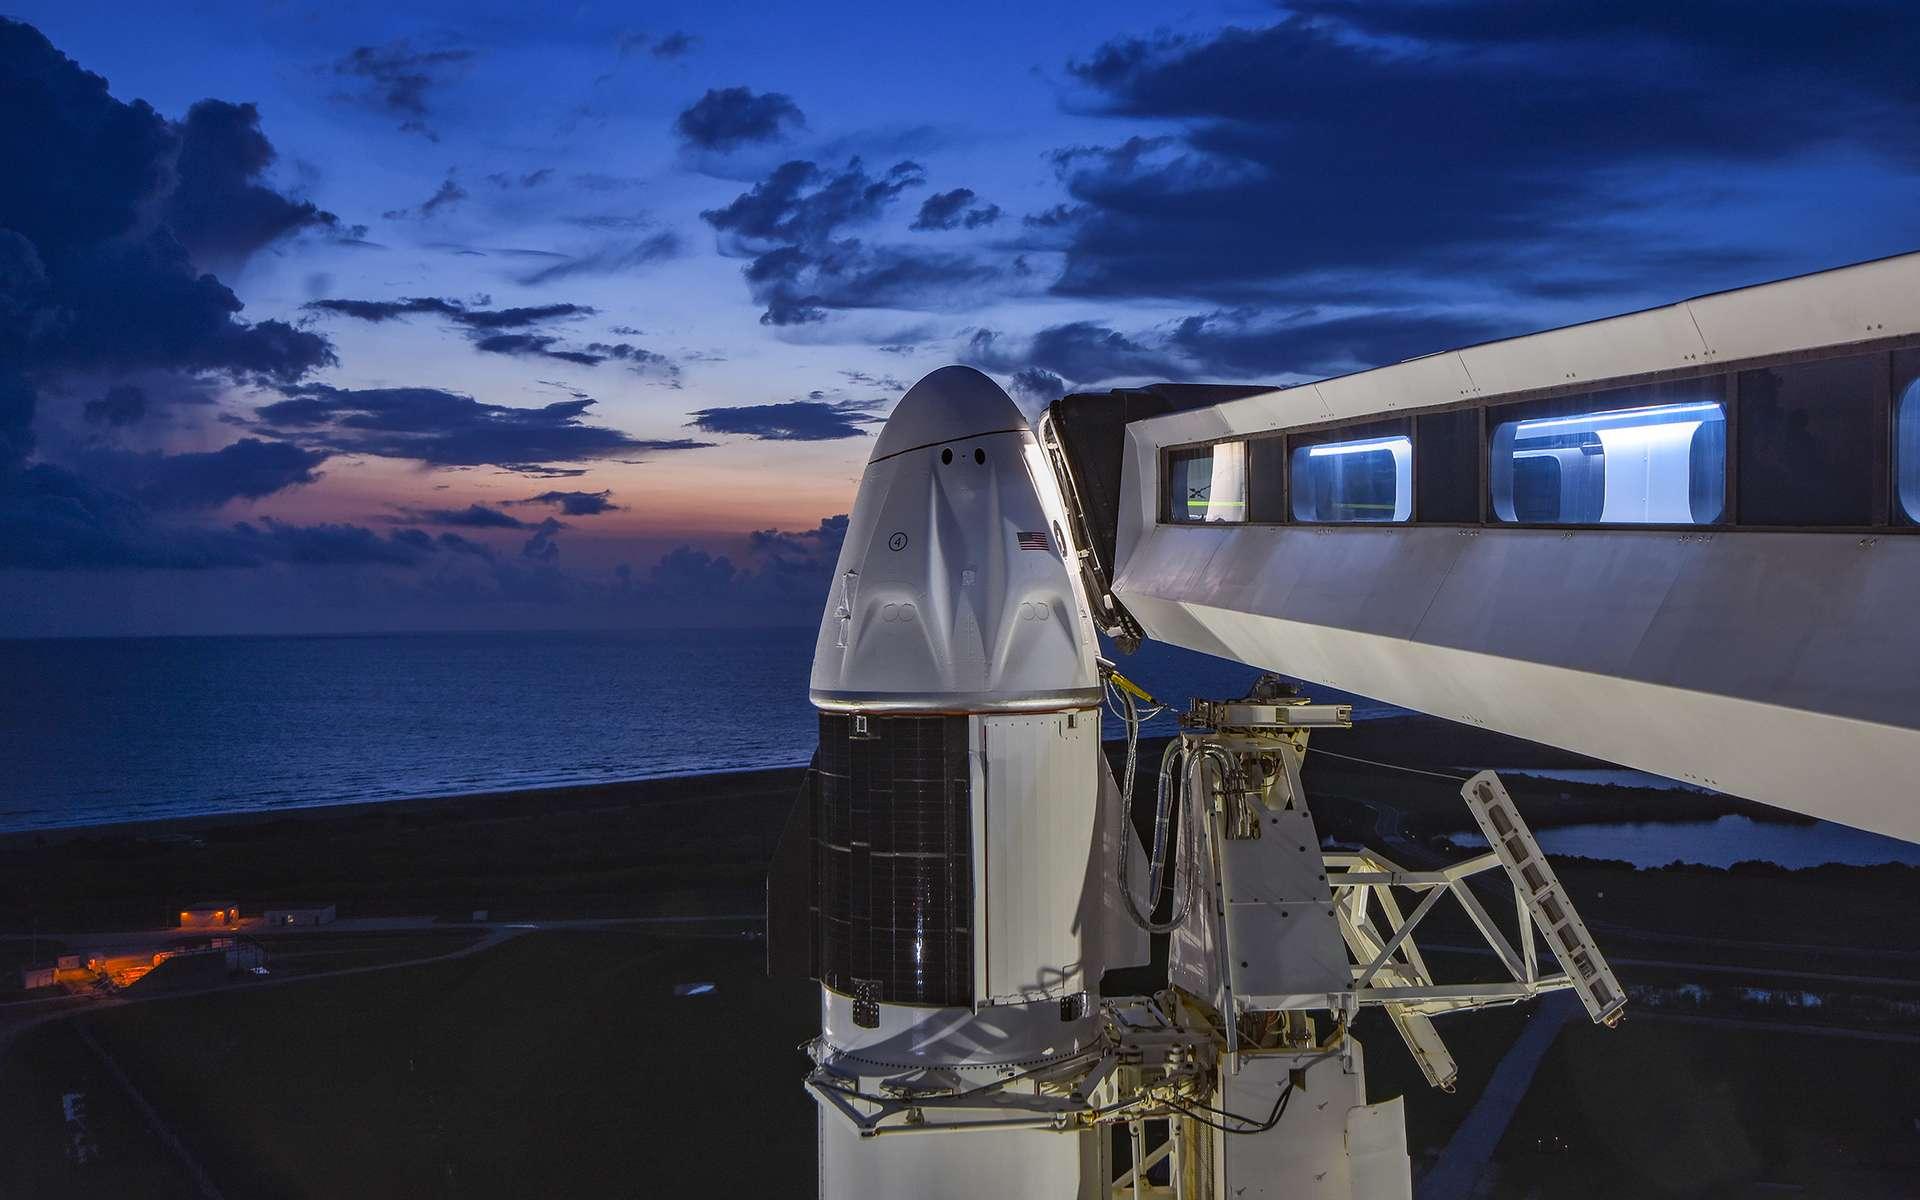 Le Crew Dragon de la mission Inspiration4. © SpaceX